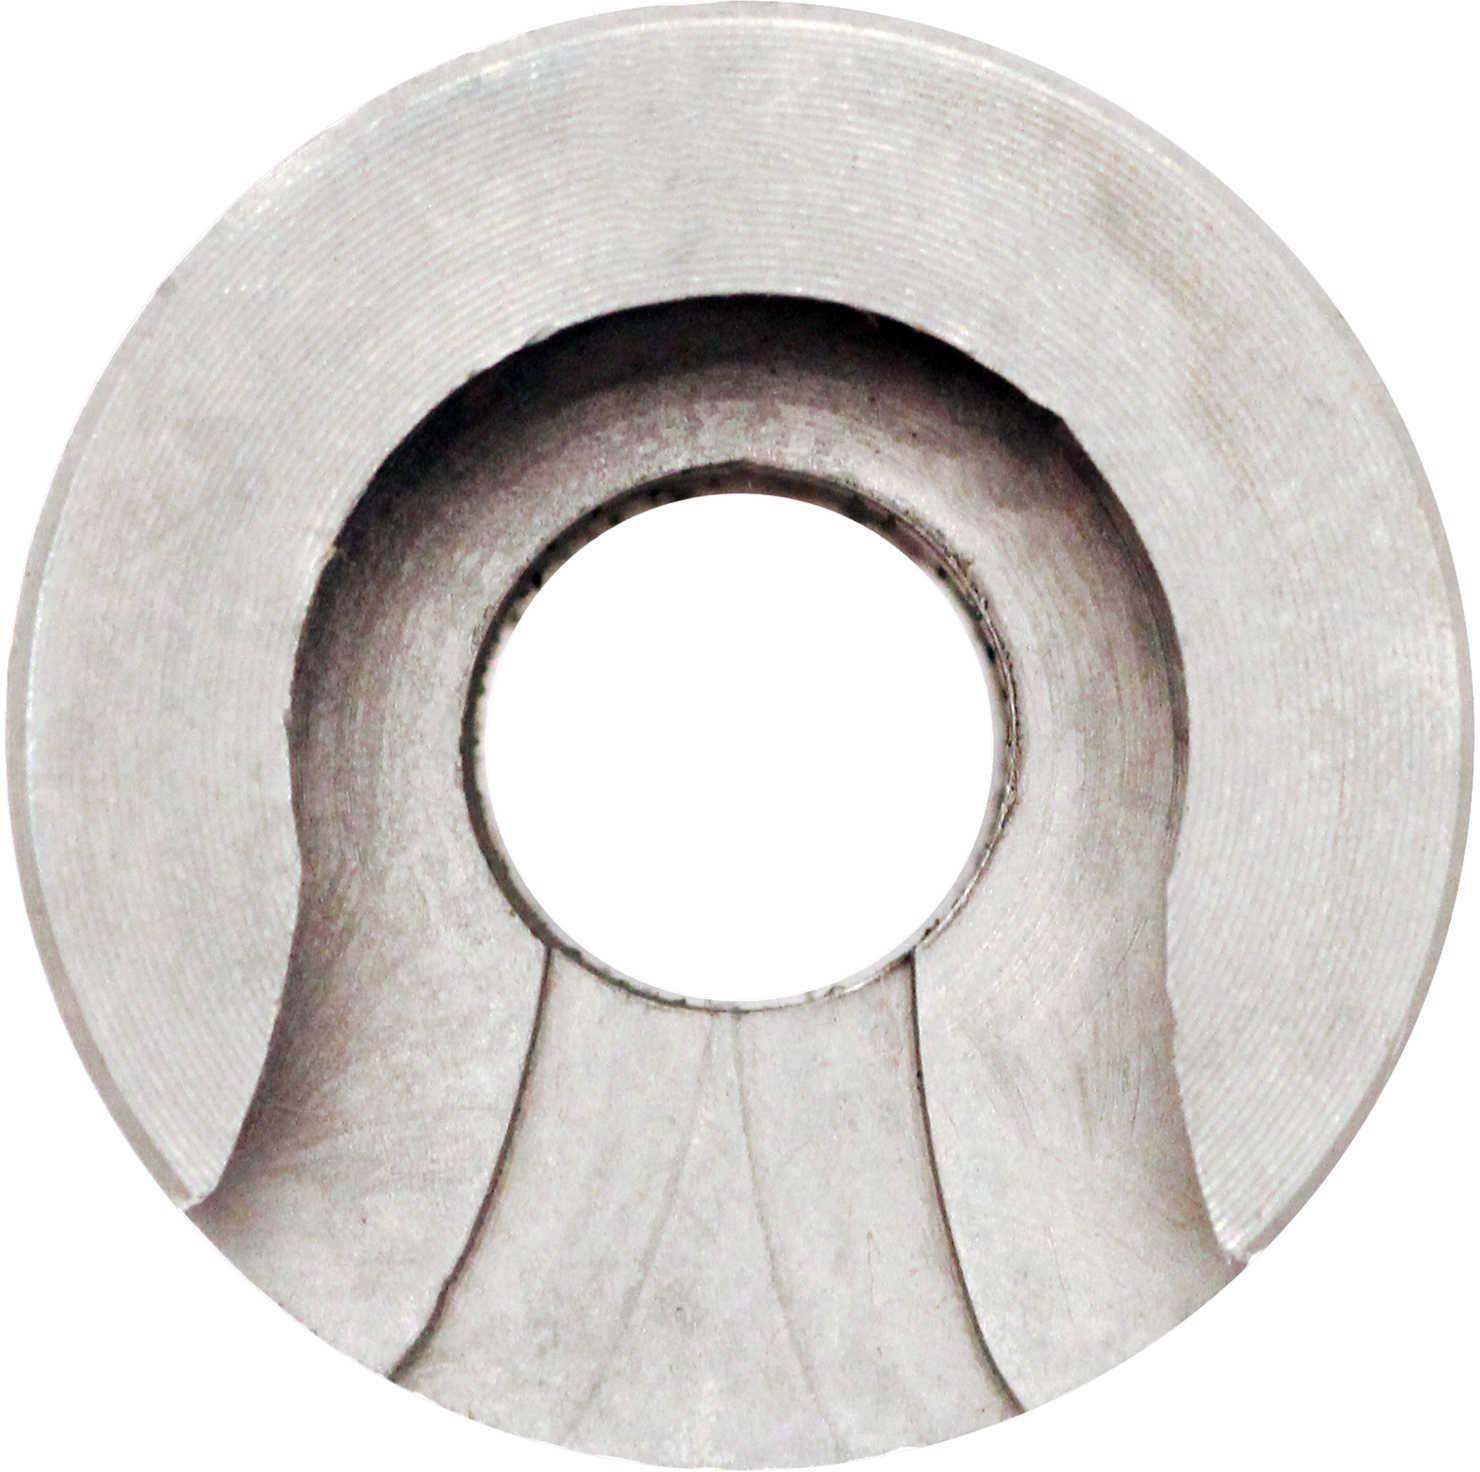 Hornady Shell Holder Size 1 Md: 390541